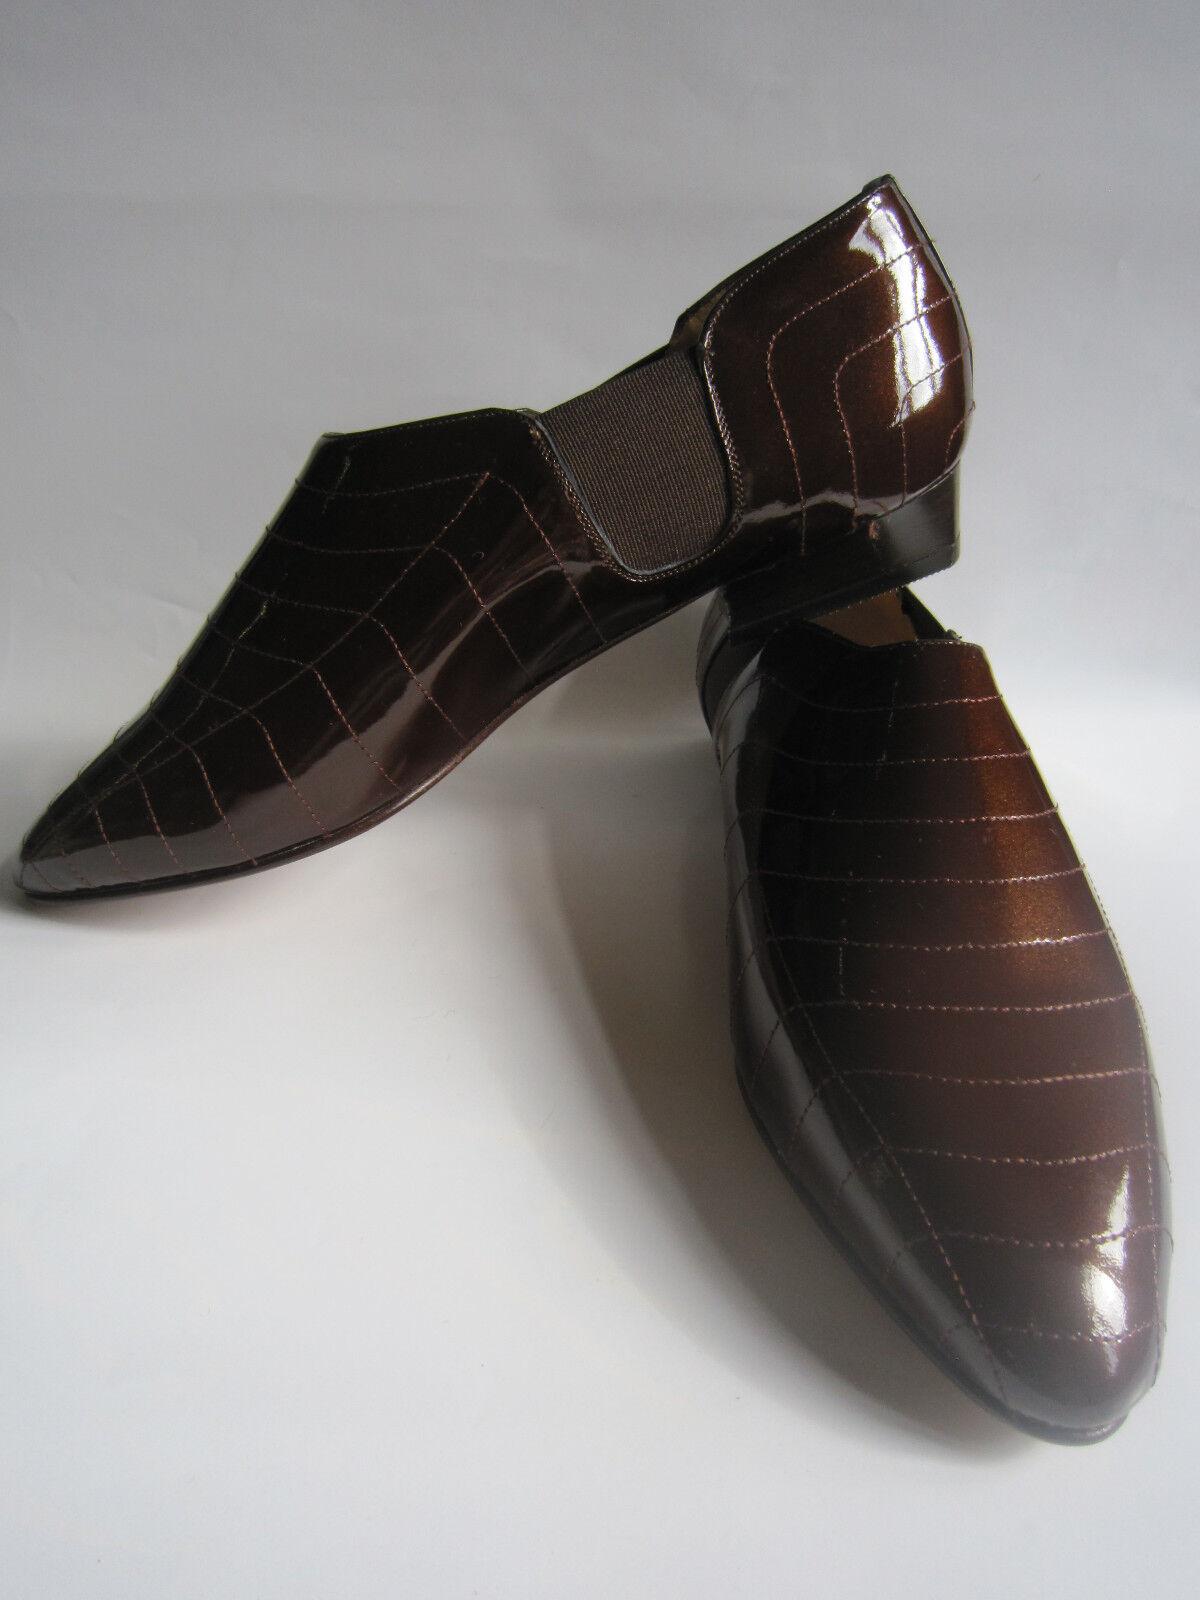 Italian designer Leder schuhe, Größe Größe Größe 37,5, UK5. New, unworn cond. Beautiful. b54e7d